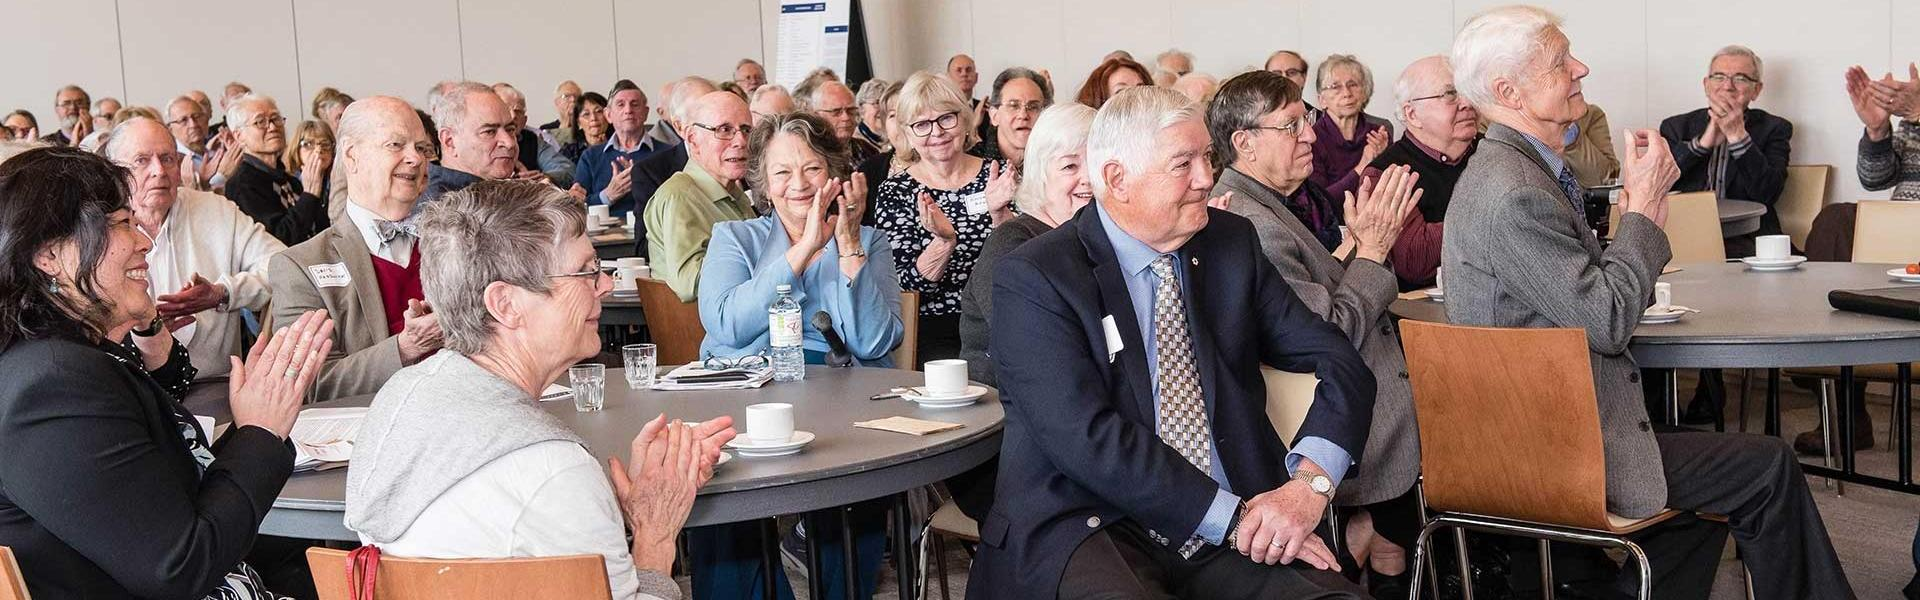 UBC Emeritus College General Meeting in Jack Poole Hall, 2018